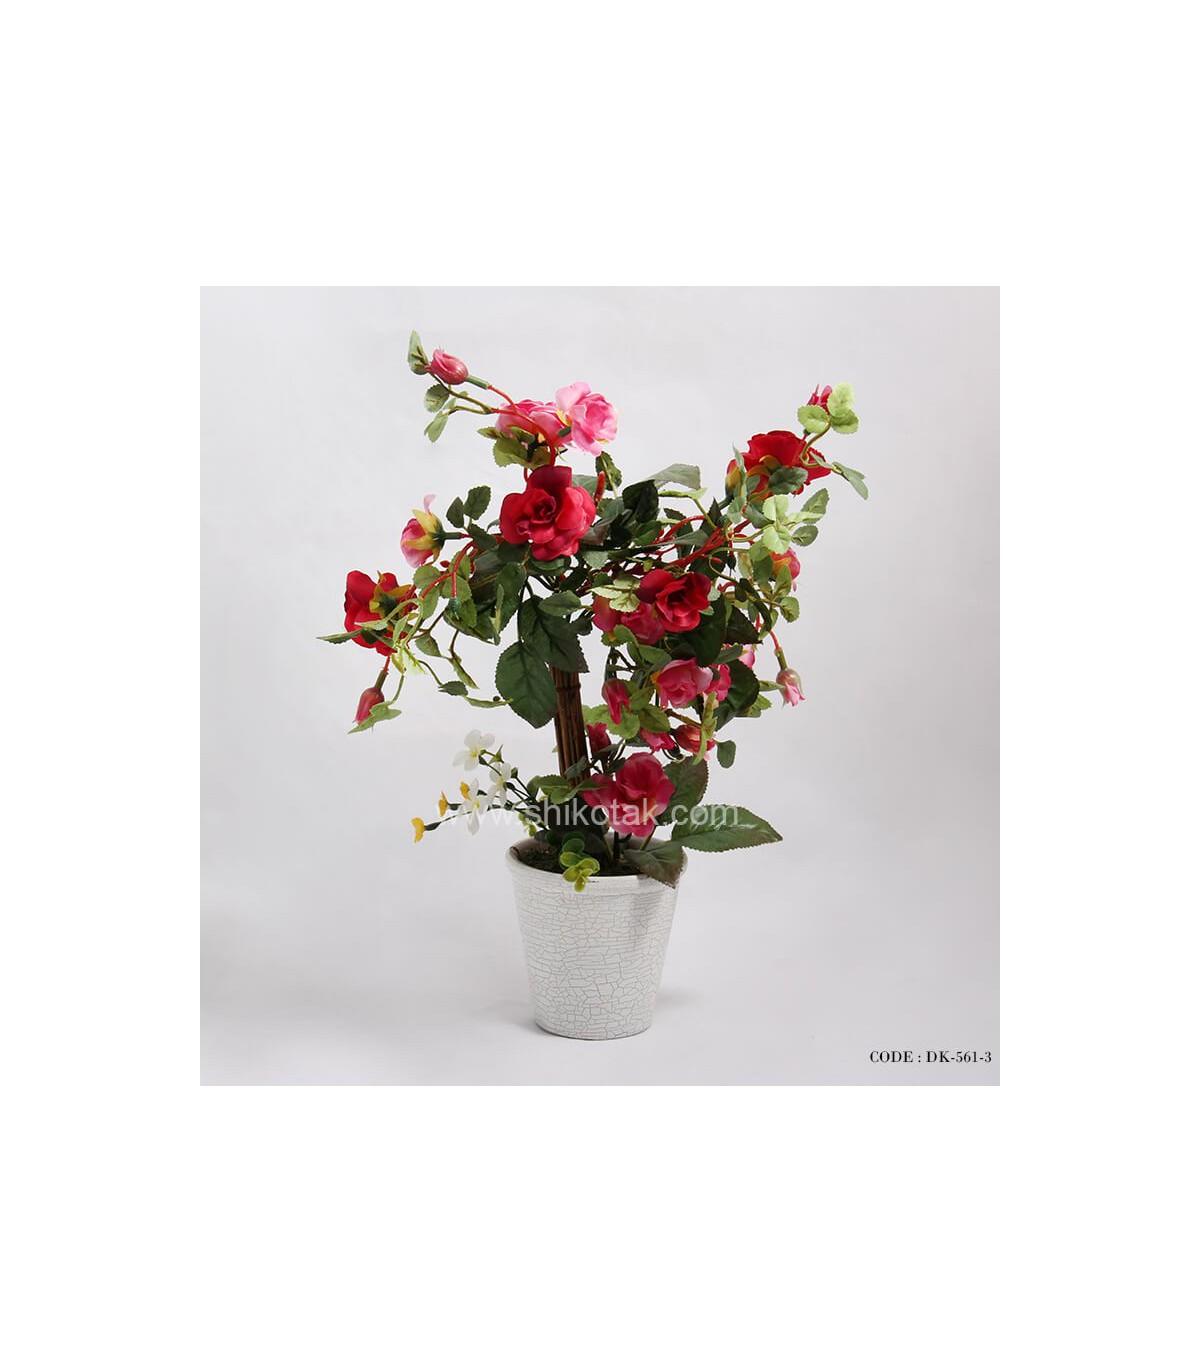 گلدان بوته رز مصنوعی